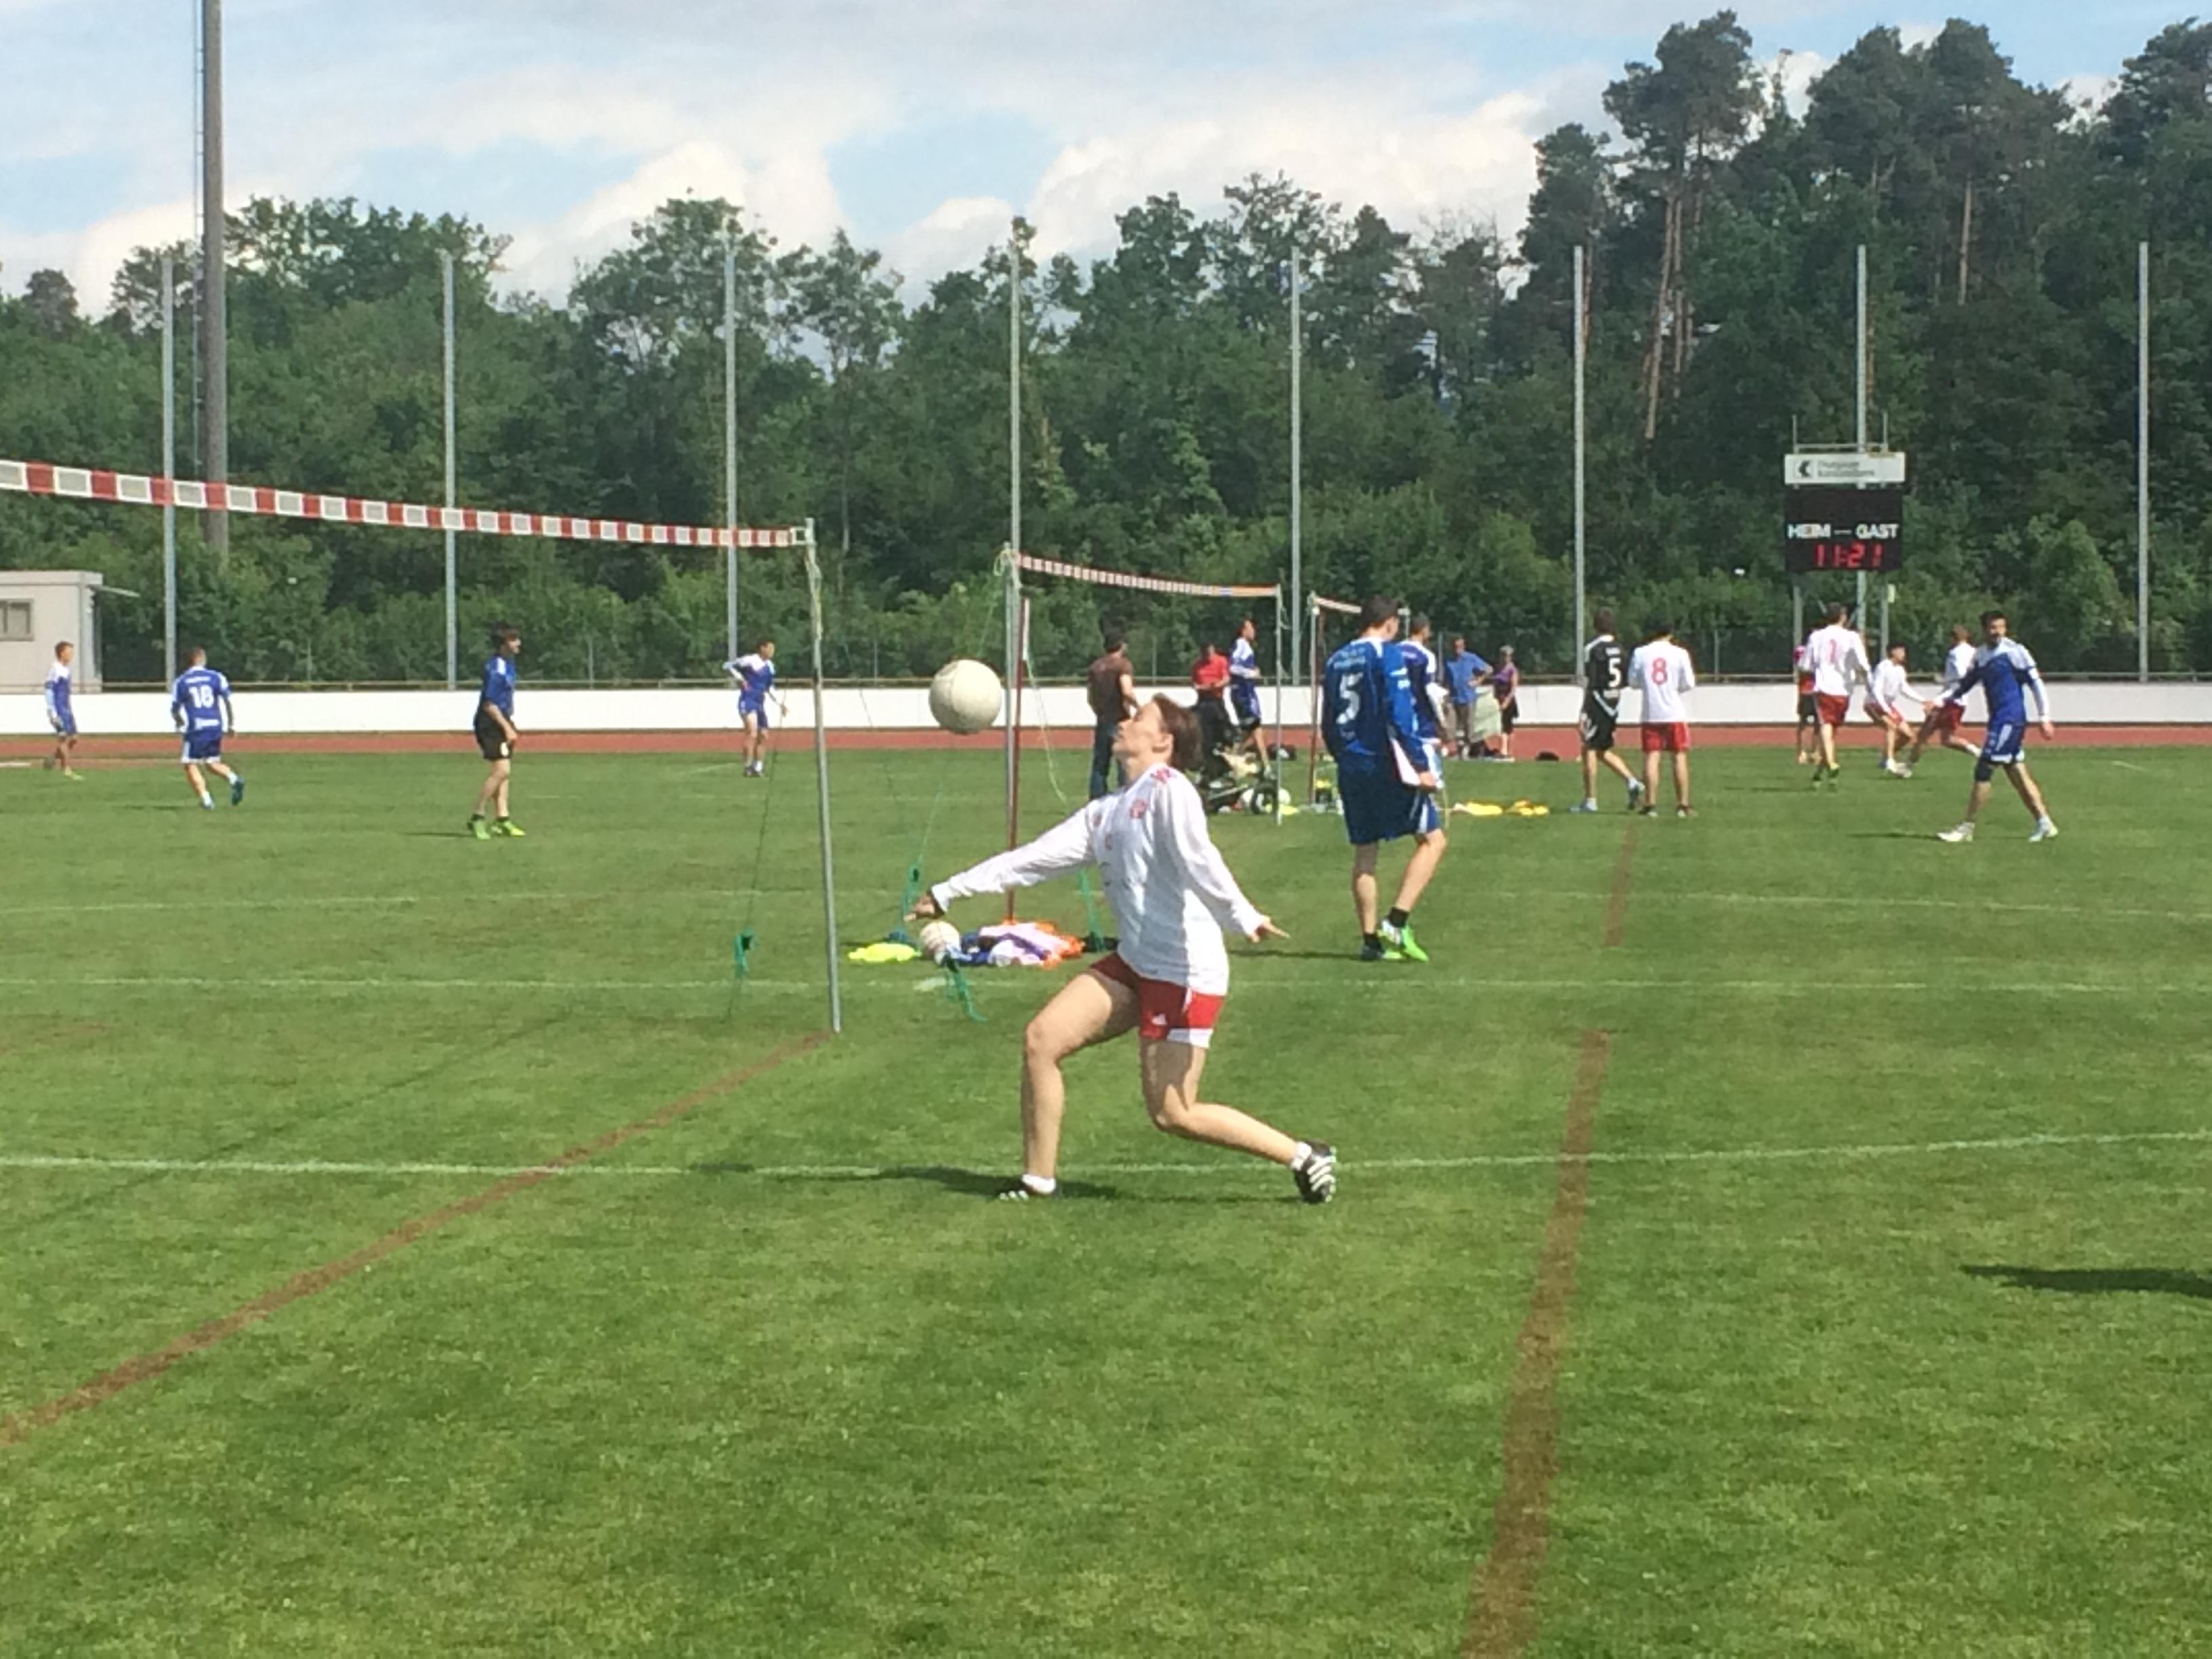 Int. Auffahrts-Faustball-Turnier